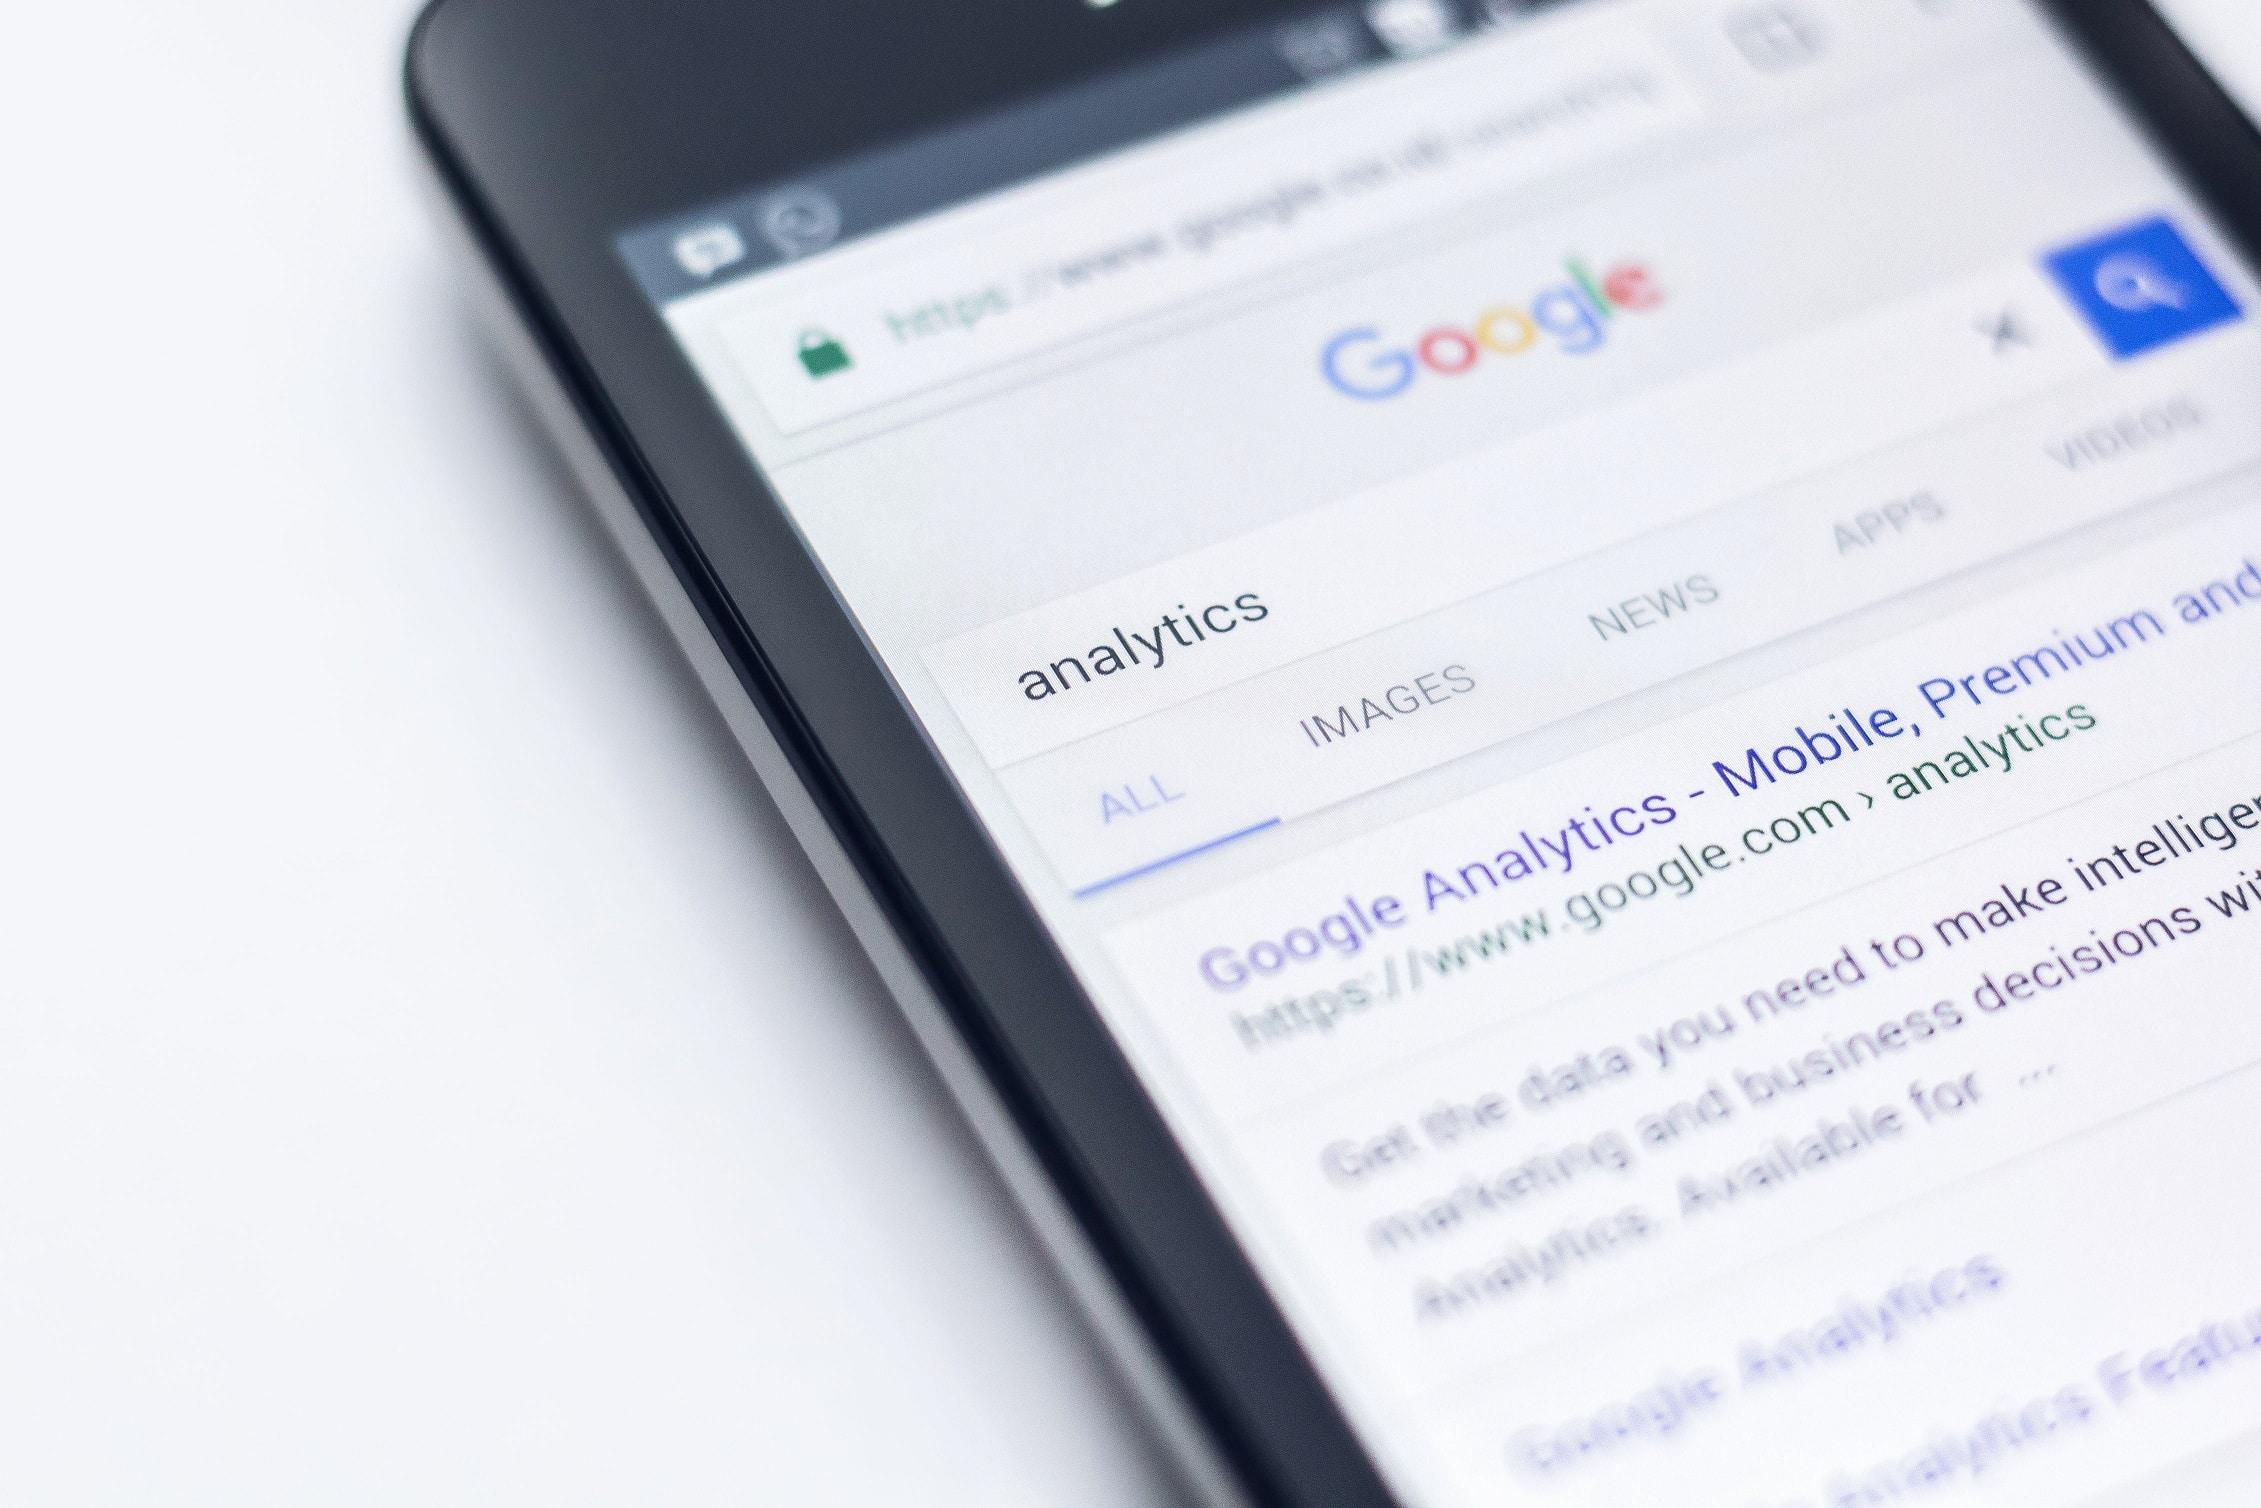 Google Announces New Ad Position Metrics